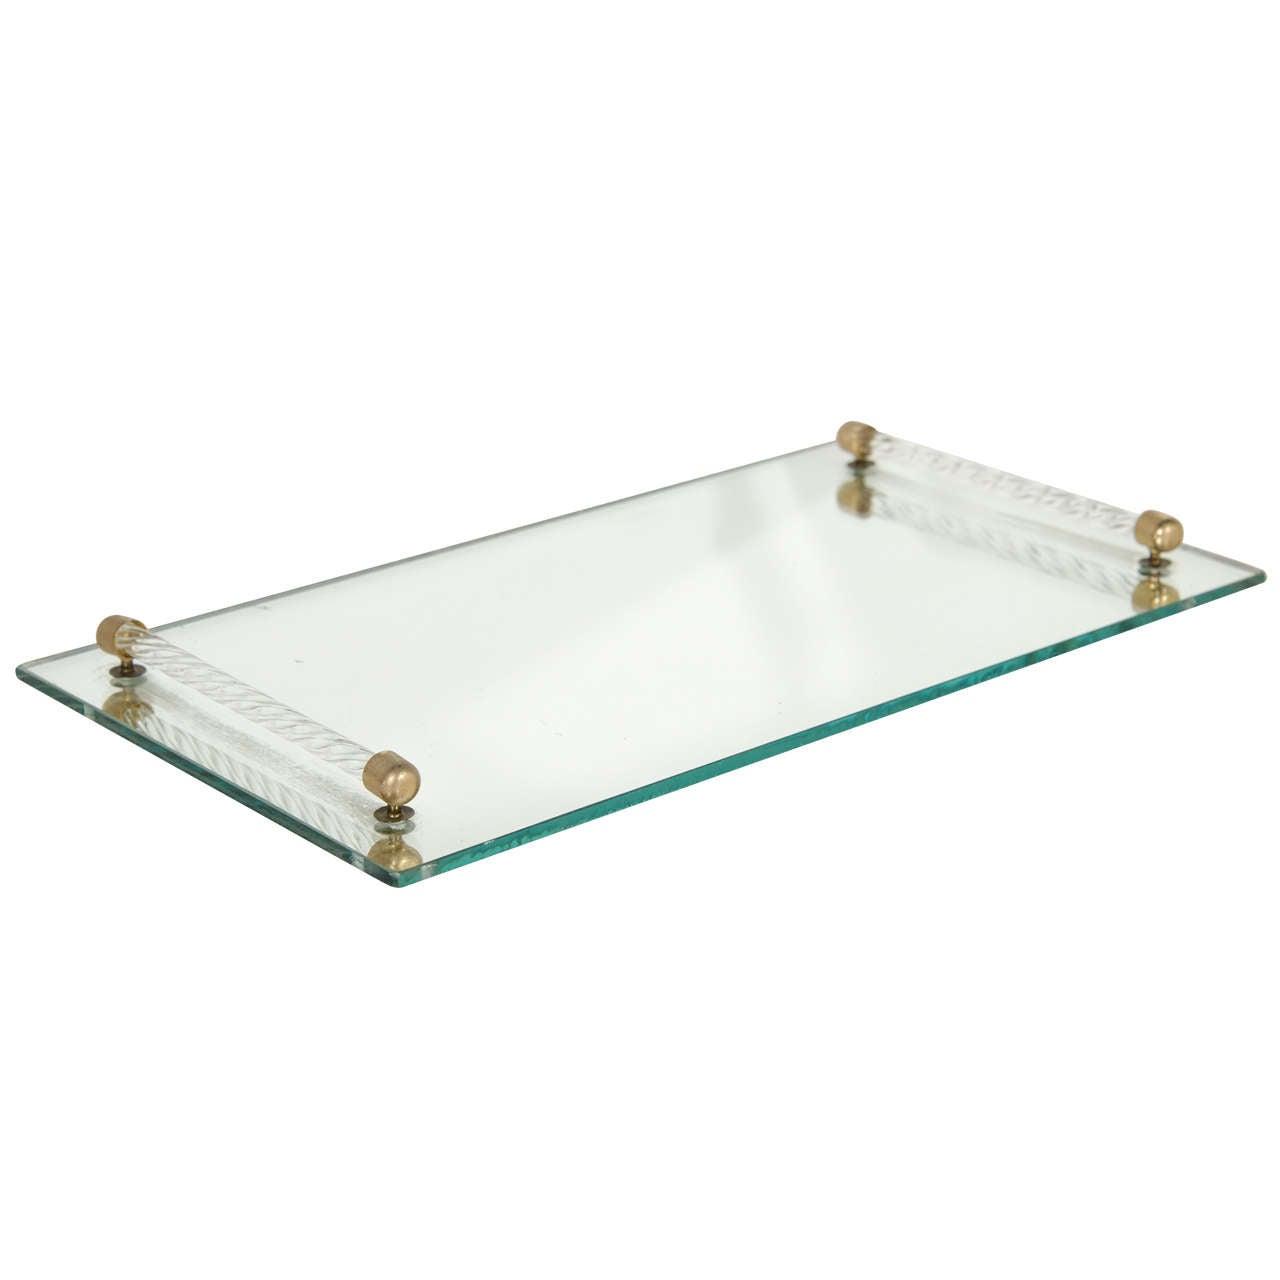 Hollywood mirrored vanity tray at 1stdibs